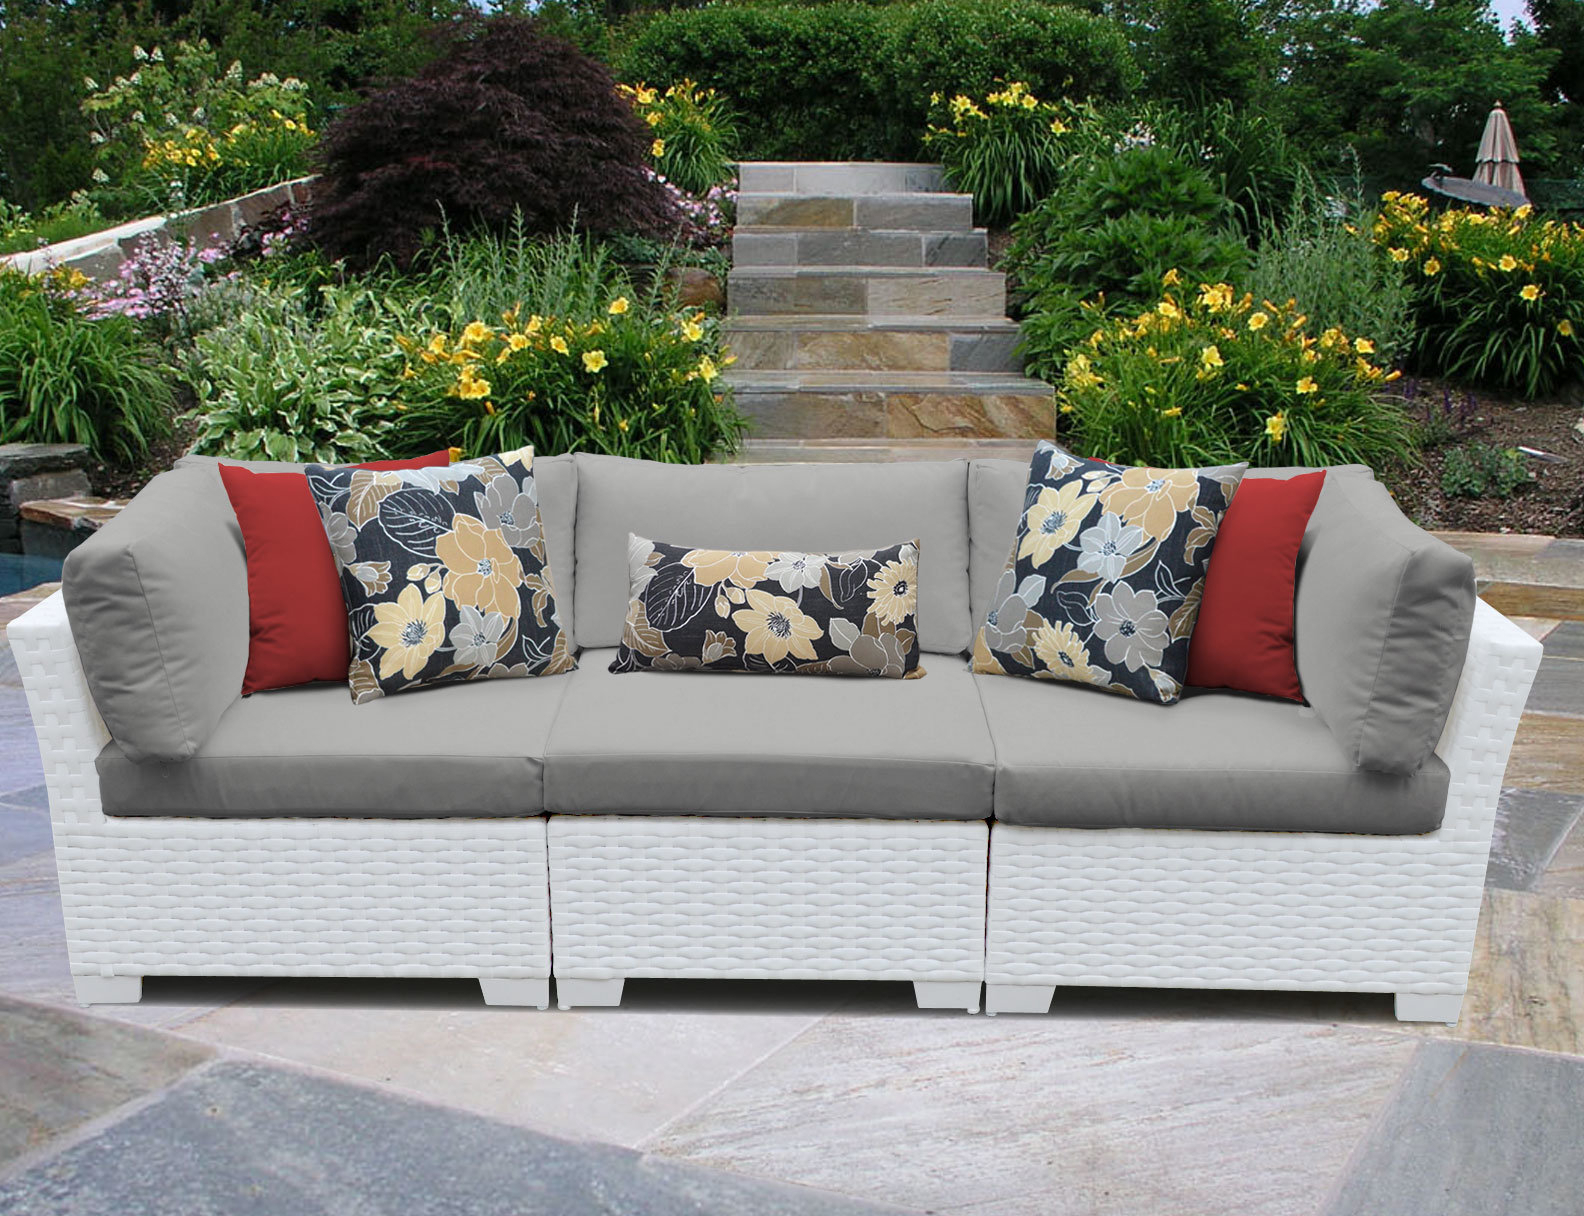 Trendy Loggins Patio Sofas With Cushions Pertaining To Monaco Patio Sofa With Cushions (View 8 of 20)